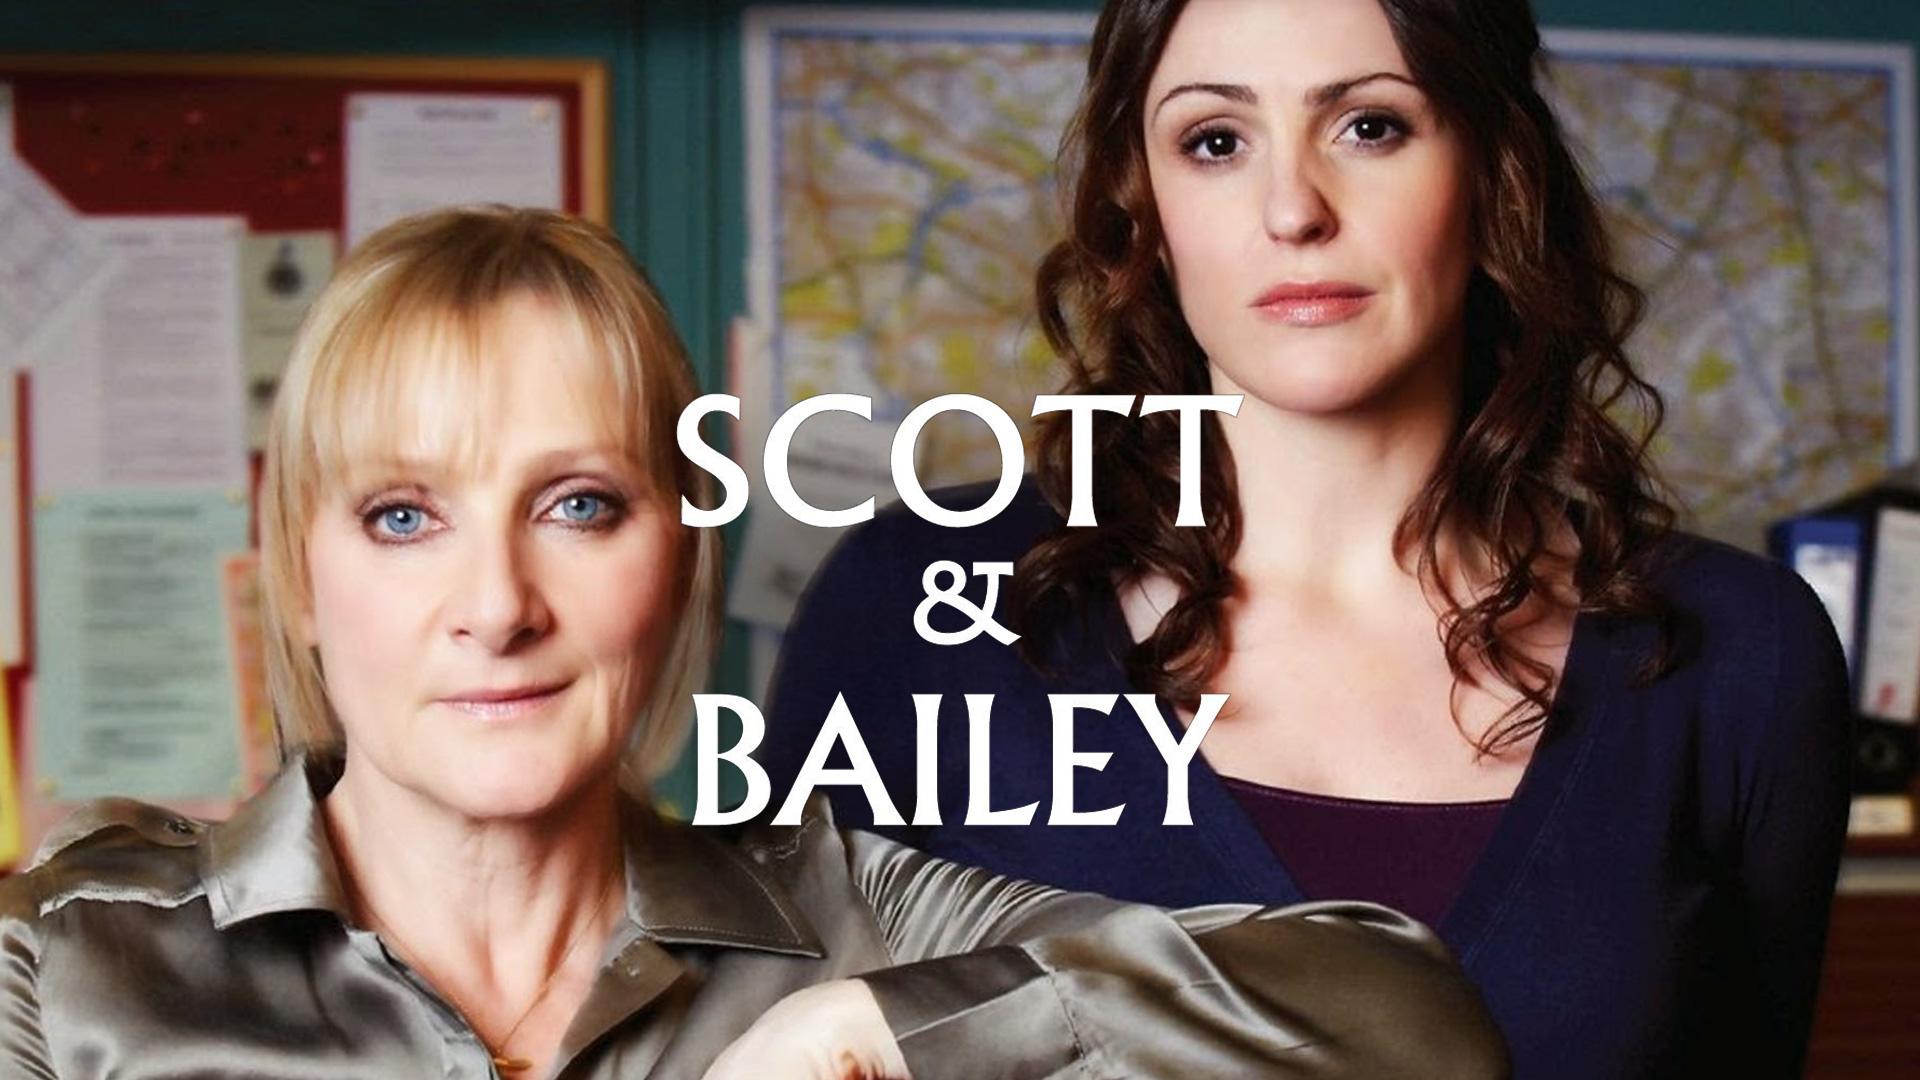 Scott & Bailey, Season 1